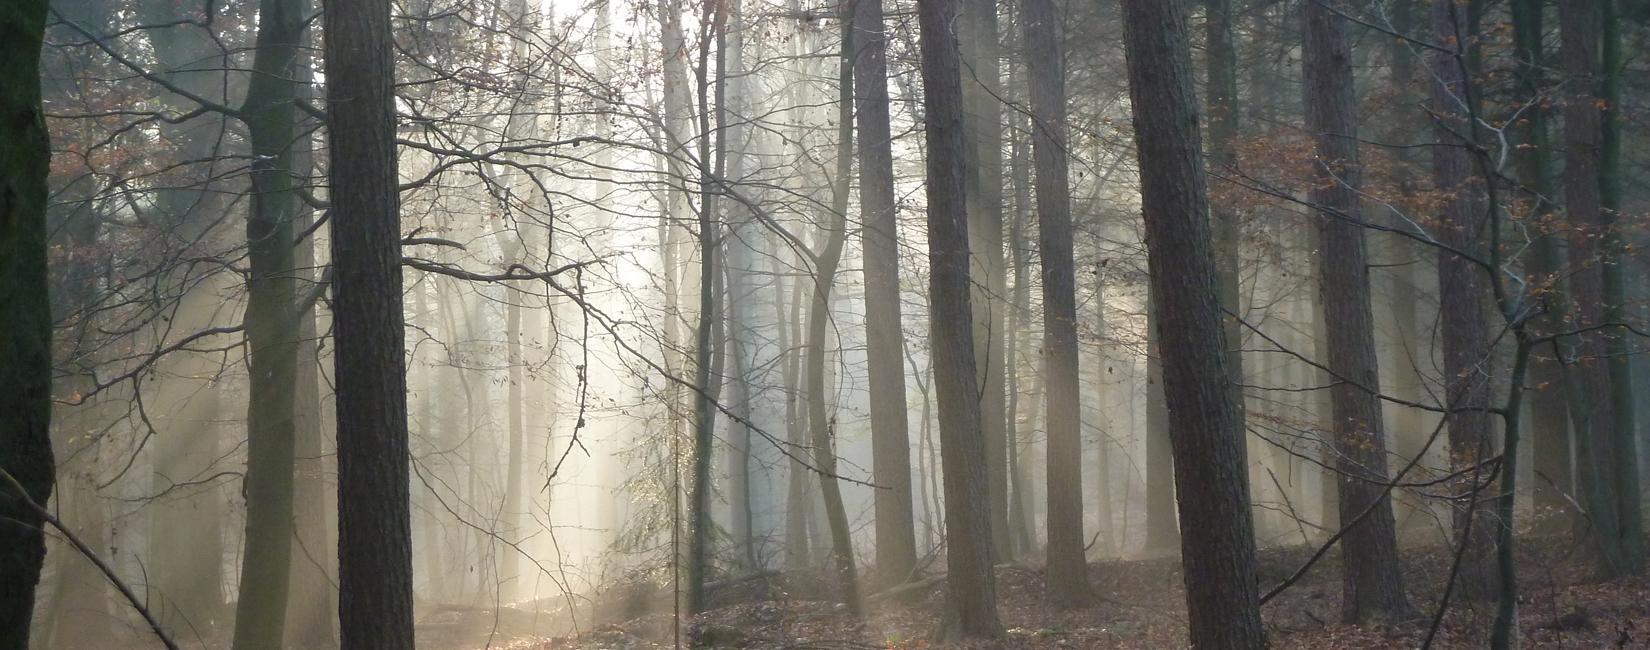 Wald_2